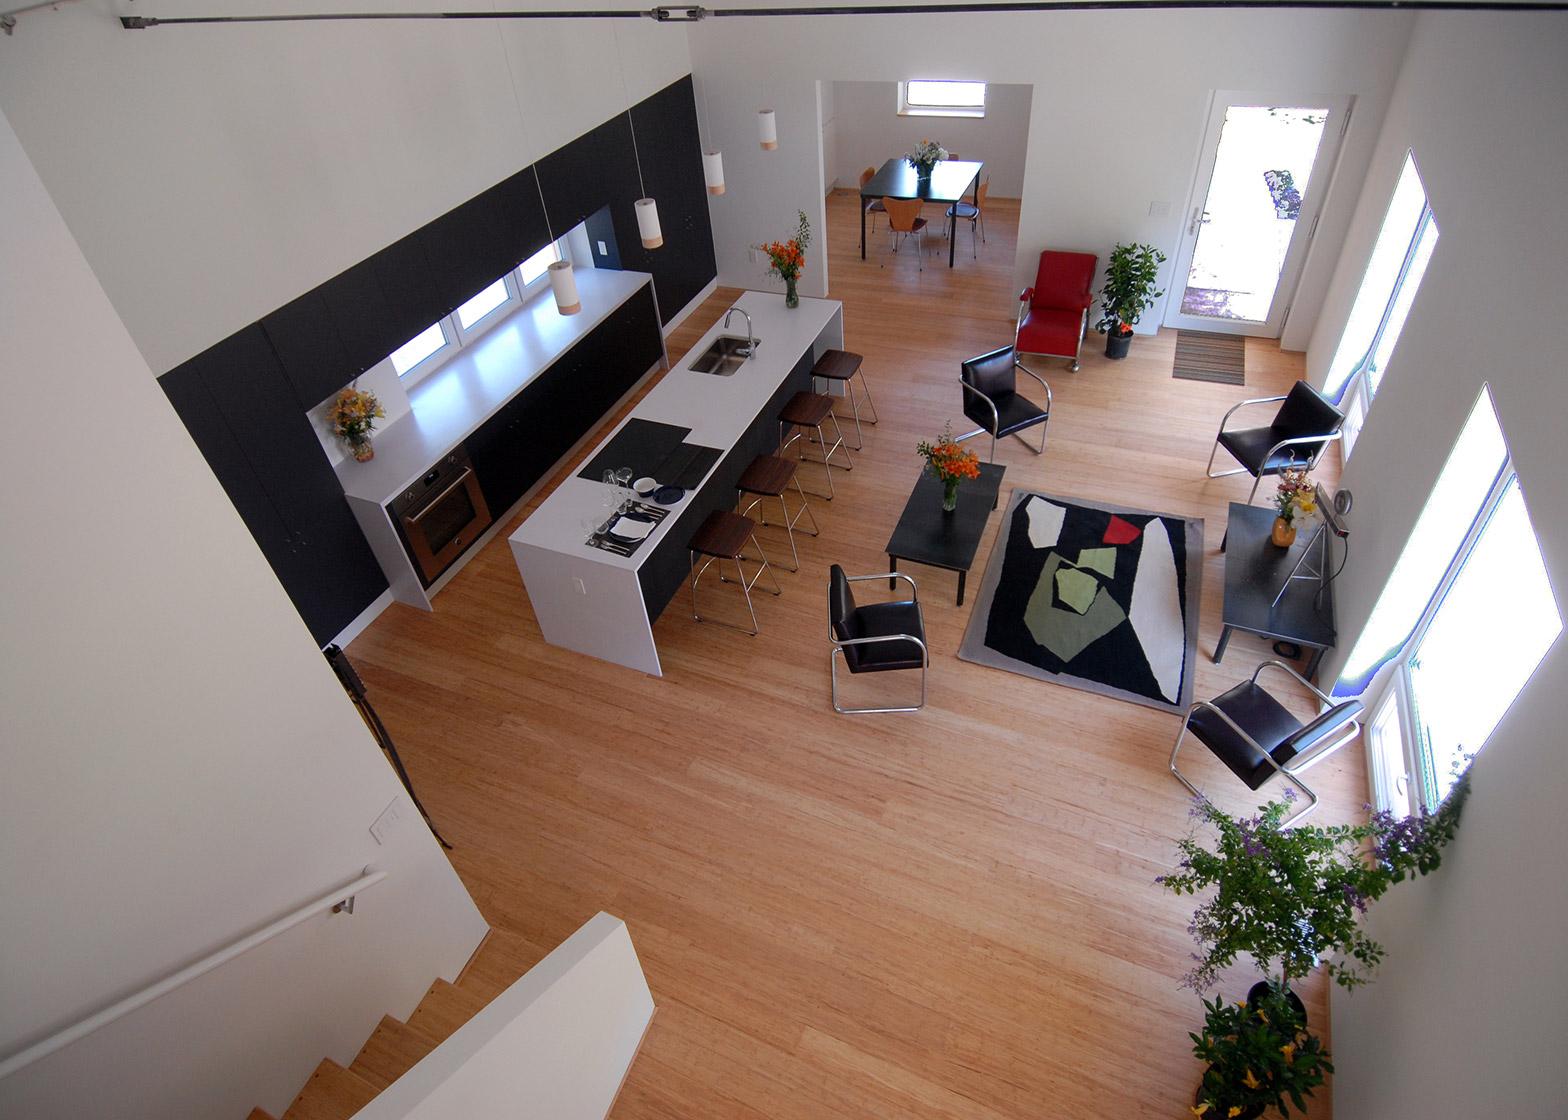 Studio 804 builds Kansas home designed to achieve net-zero energy consumption